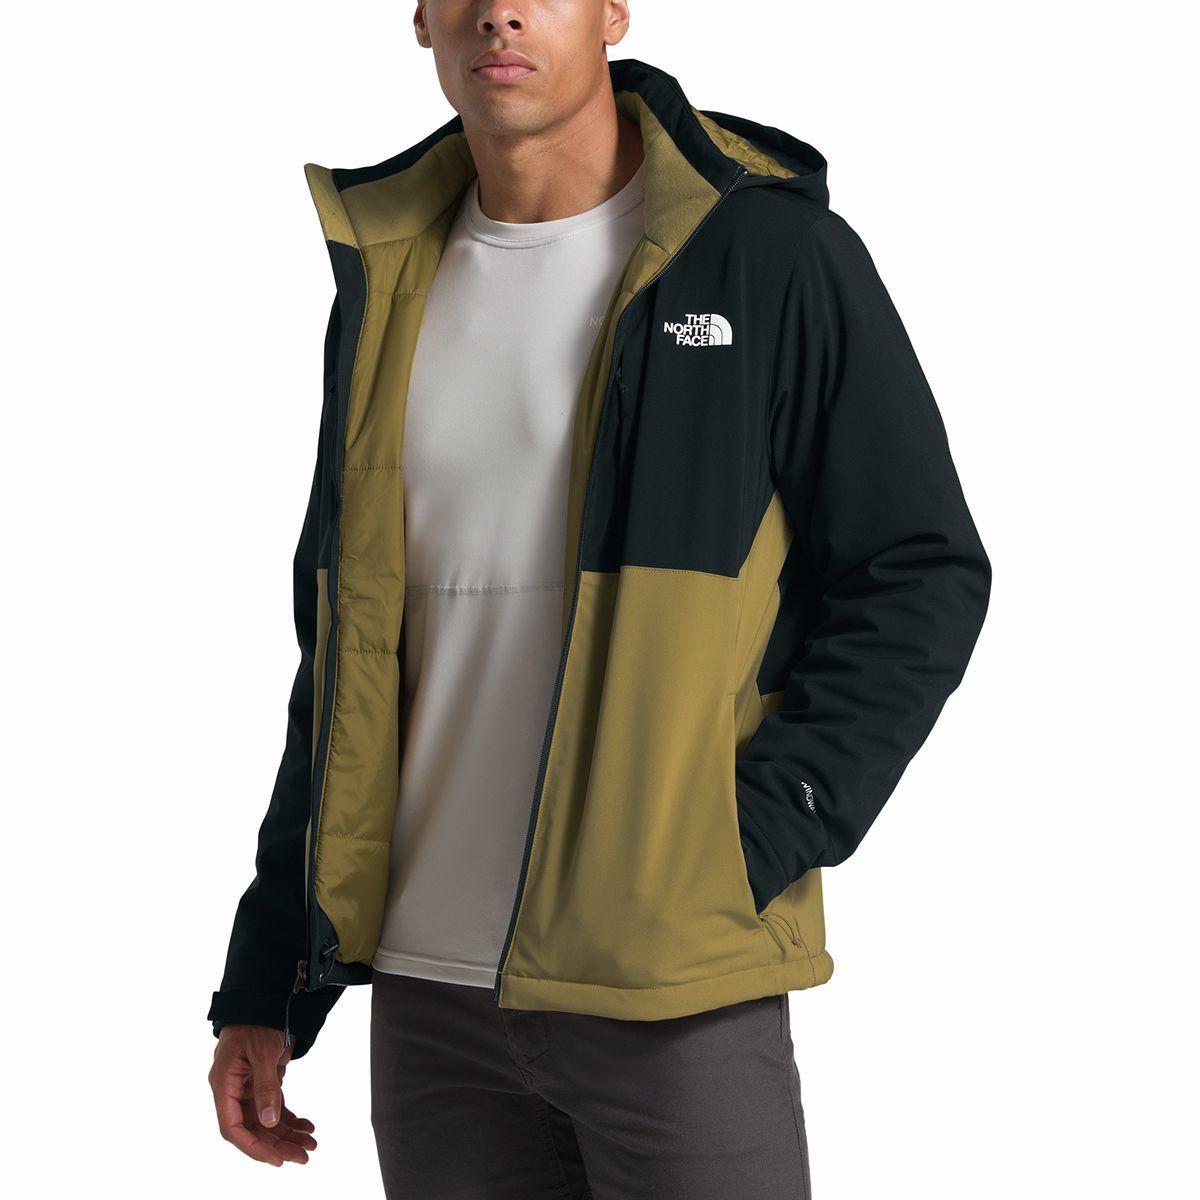 Apex Elevation Insulated Jacket - Men